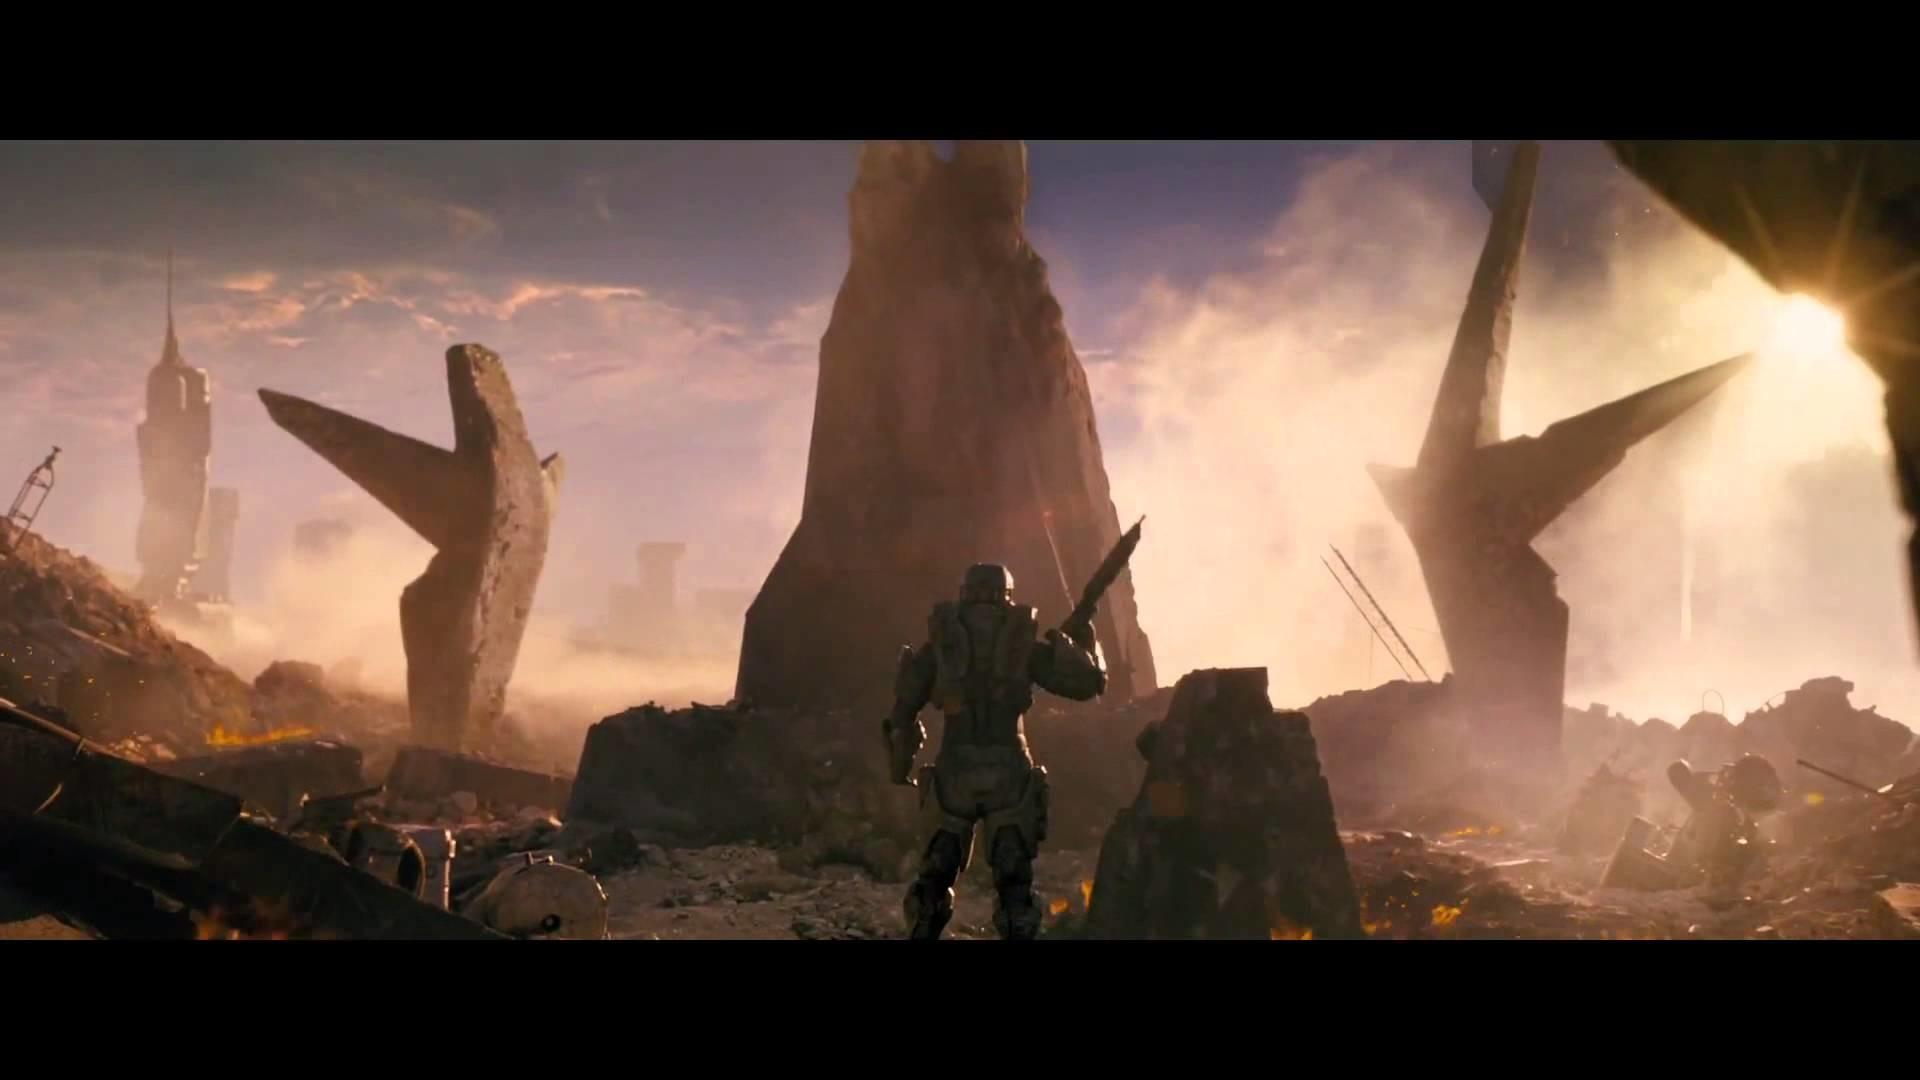 Halo 5 Guardians – Master Chief Trailer – 1080p HD